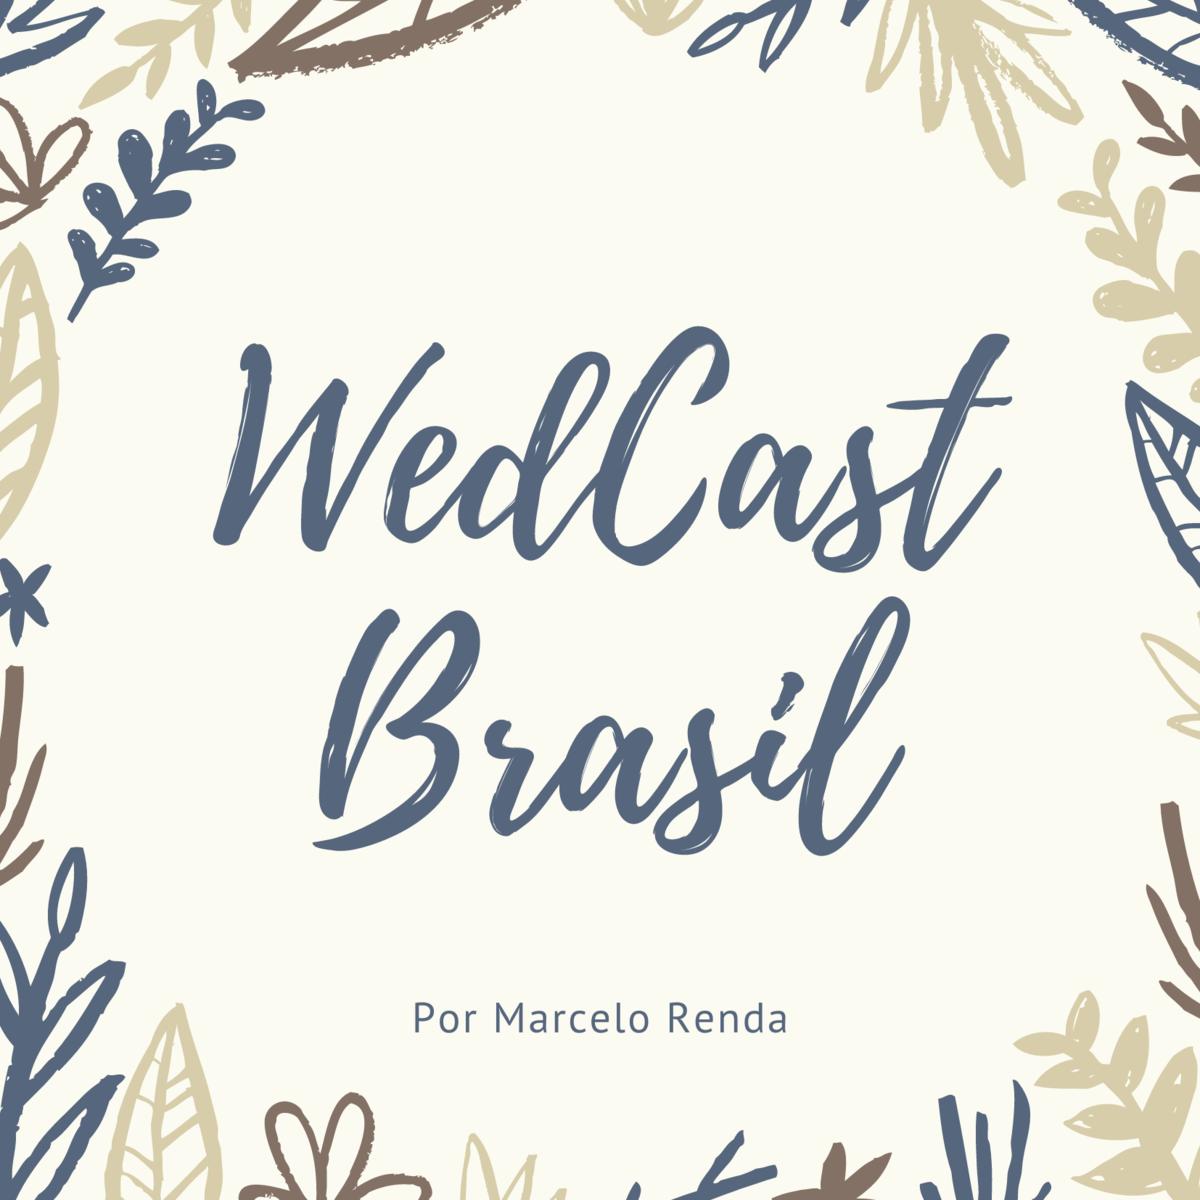 Imagem capa - WedCast Brasil #01 - Organizando o casamento por Marcelo Renda